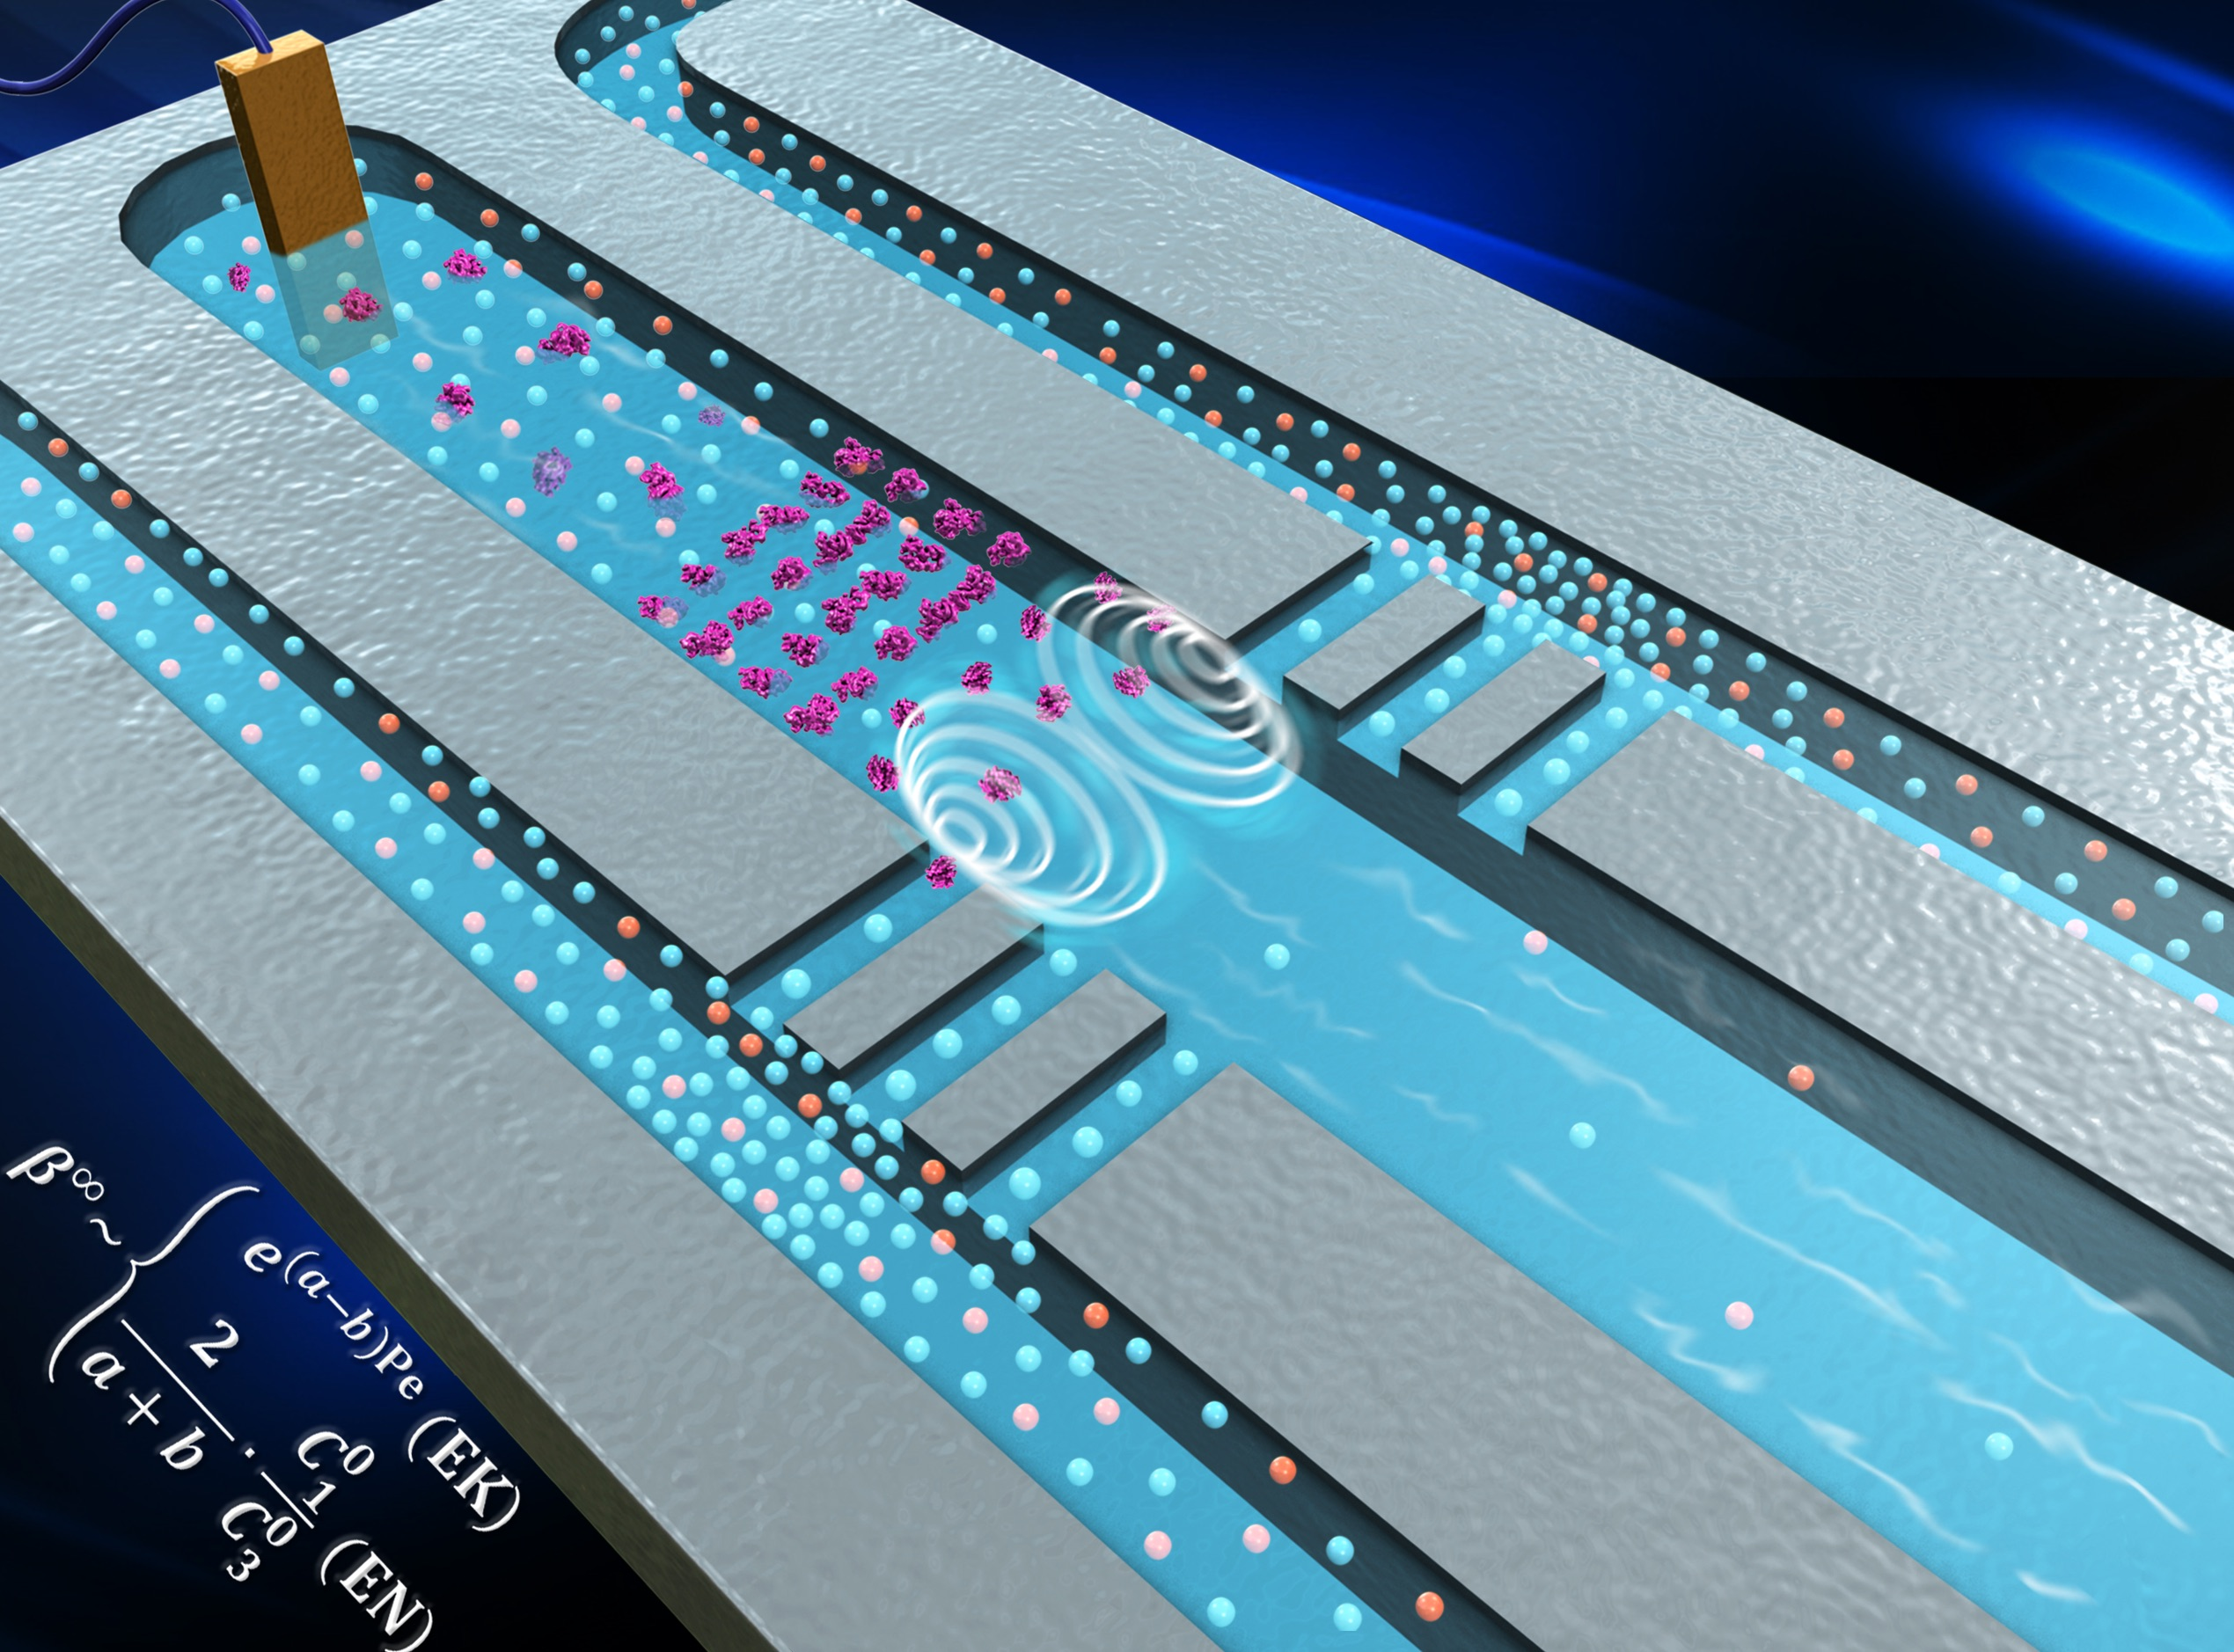 Nanoelectrokinetics